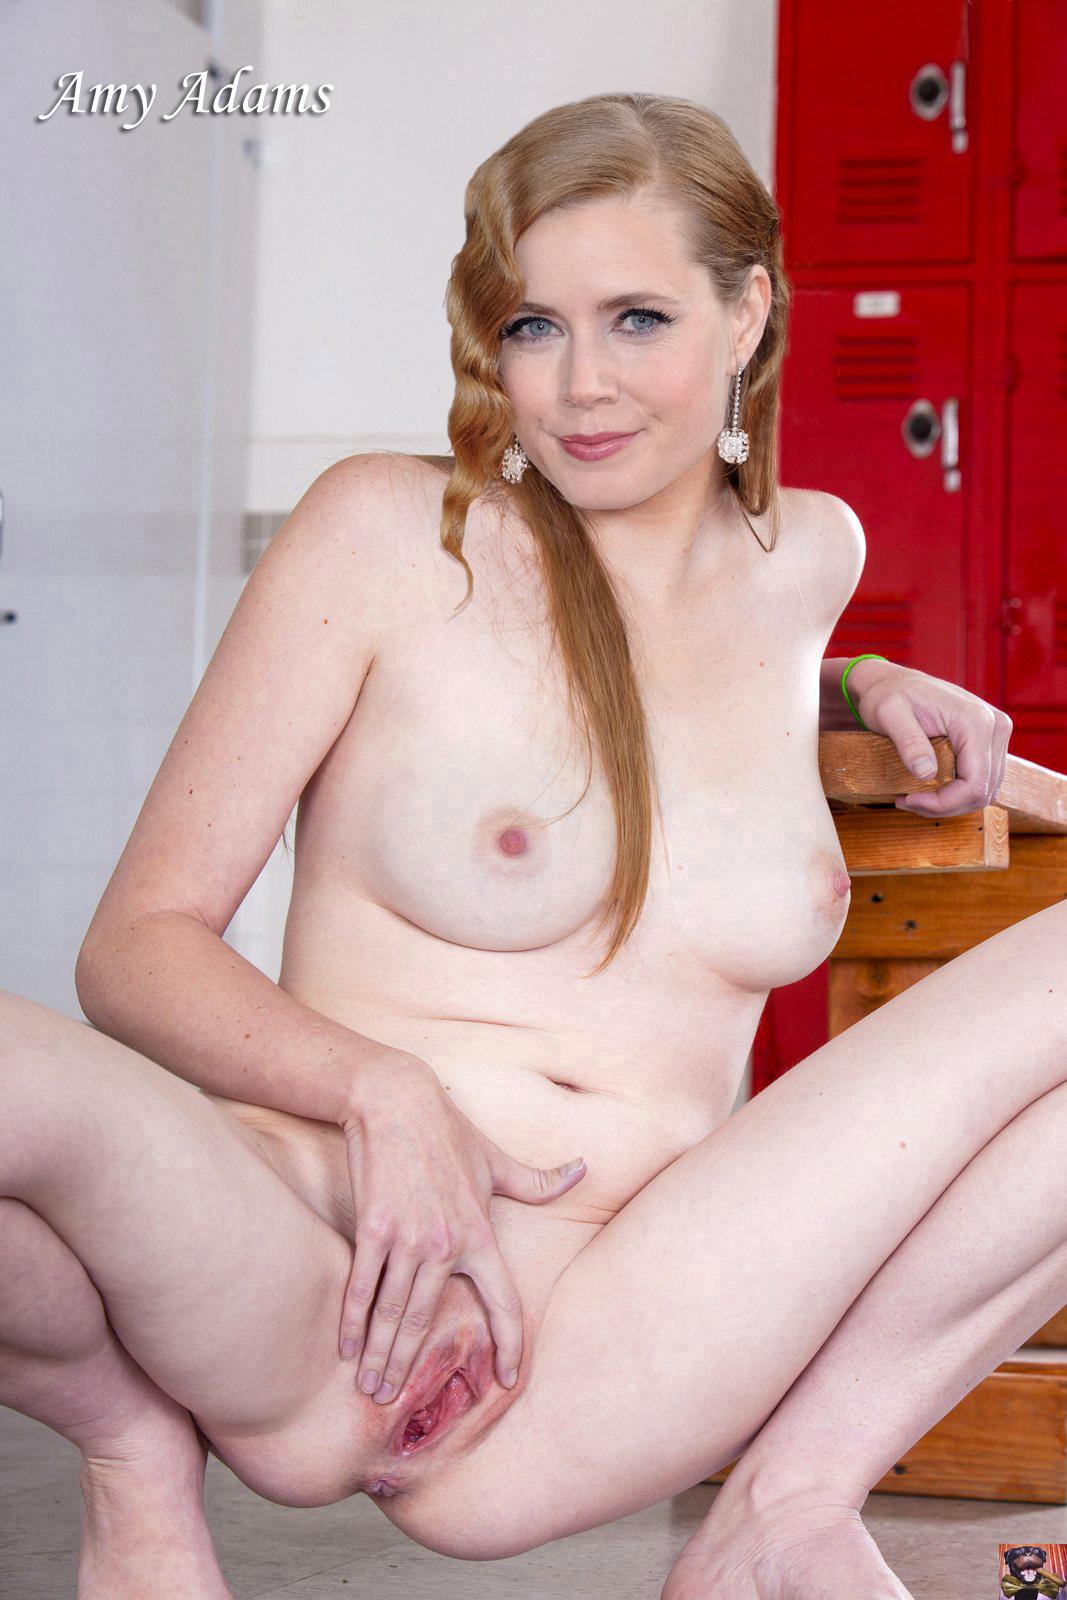 Amy adams fake topless — 6